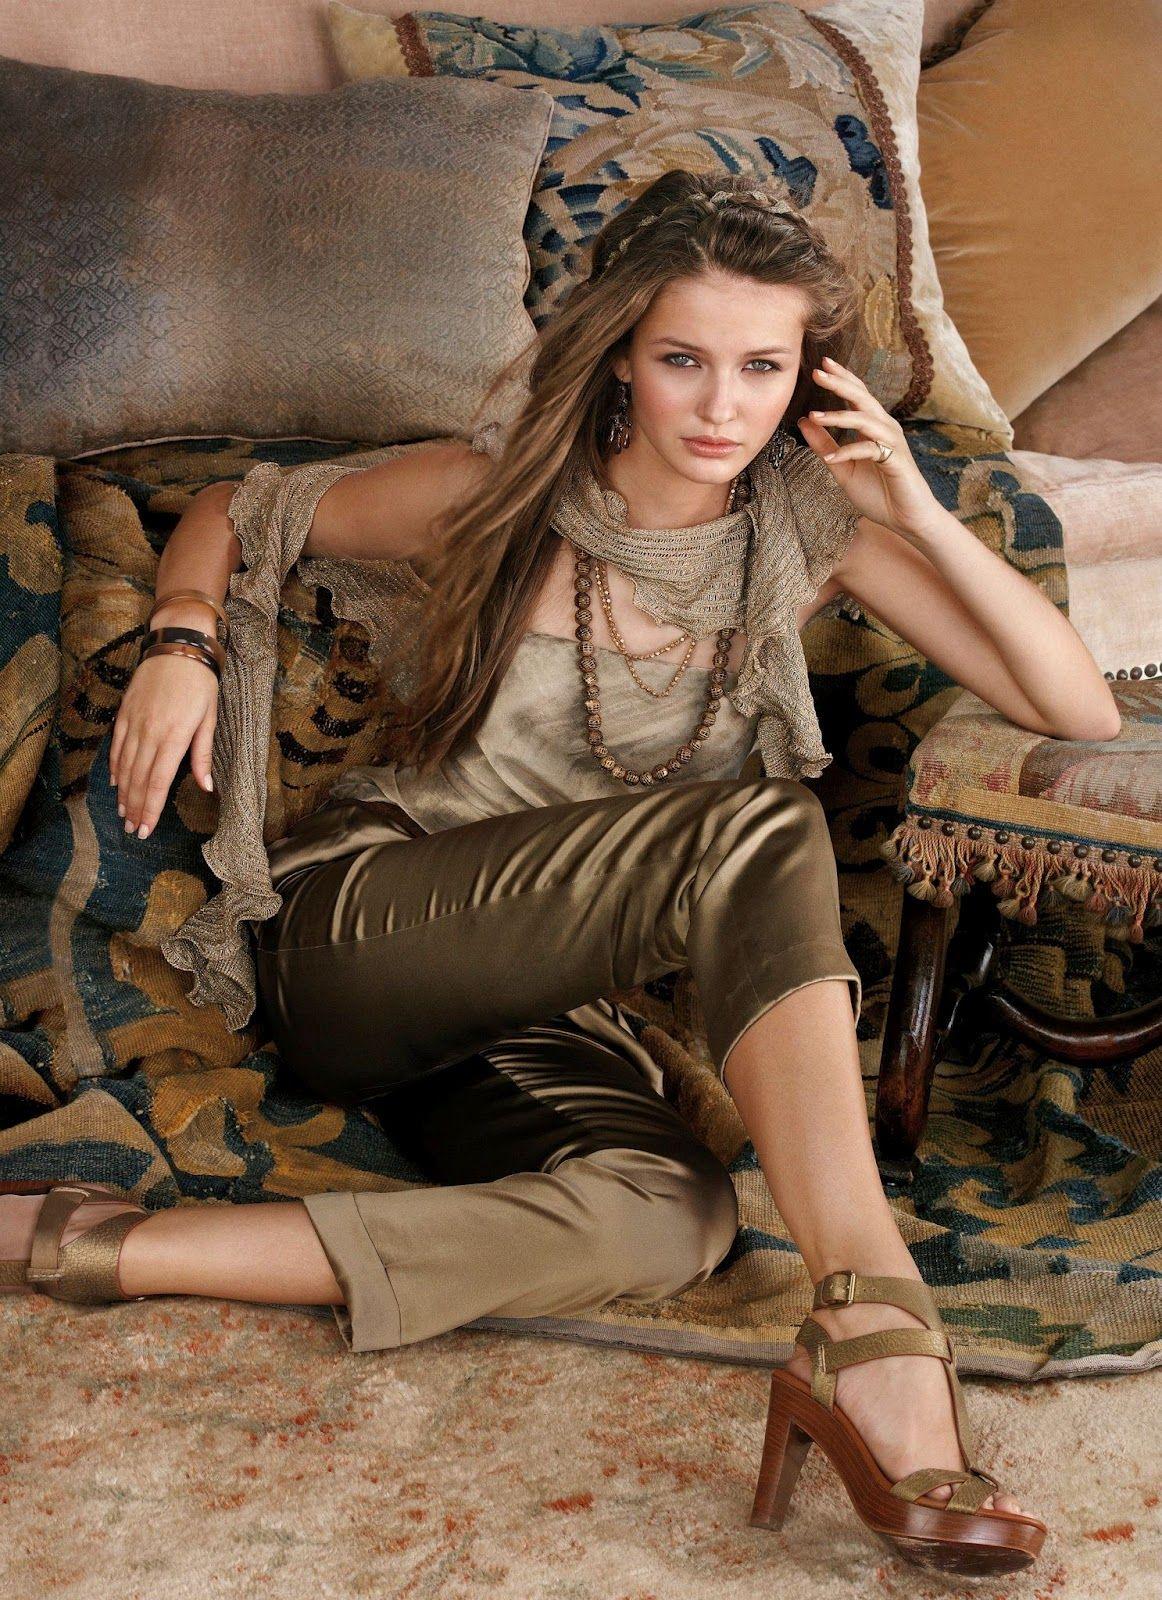 OOPS Kristina Romanova nudes (31 photos)